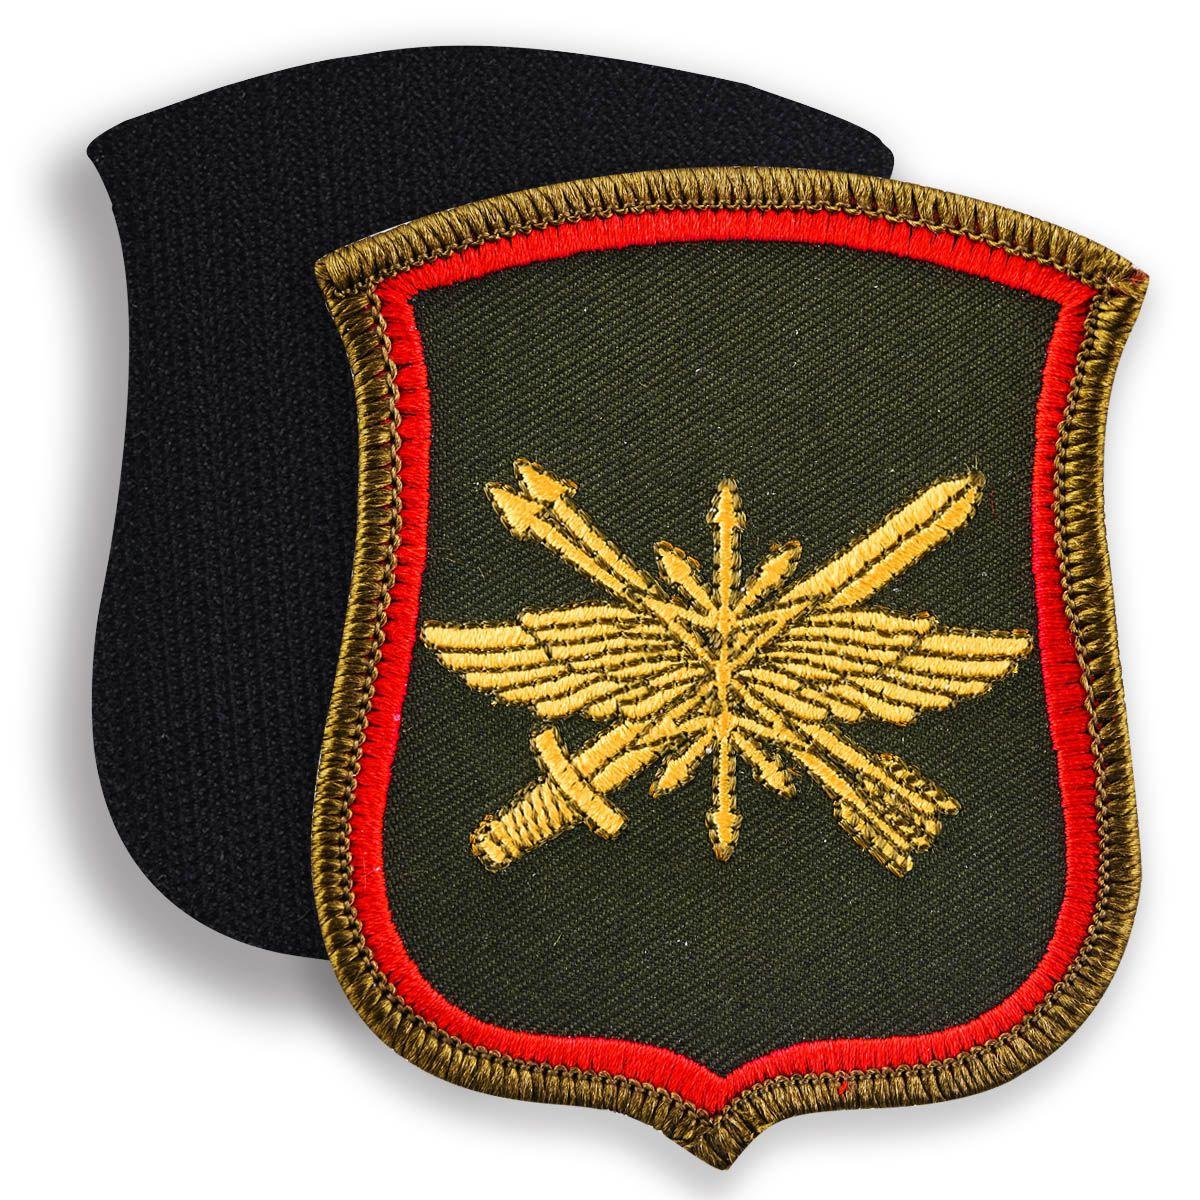 Шеврон 882-го Центрального узла связи РВСН